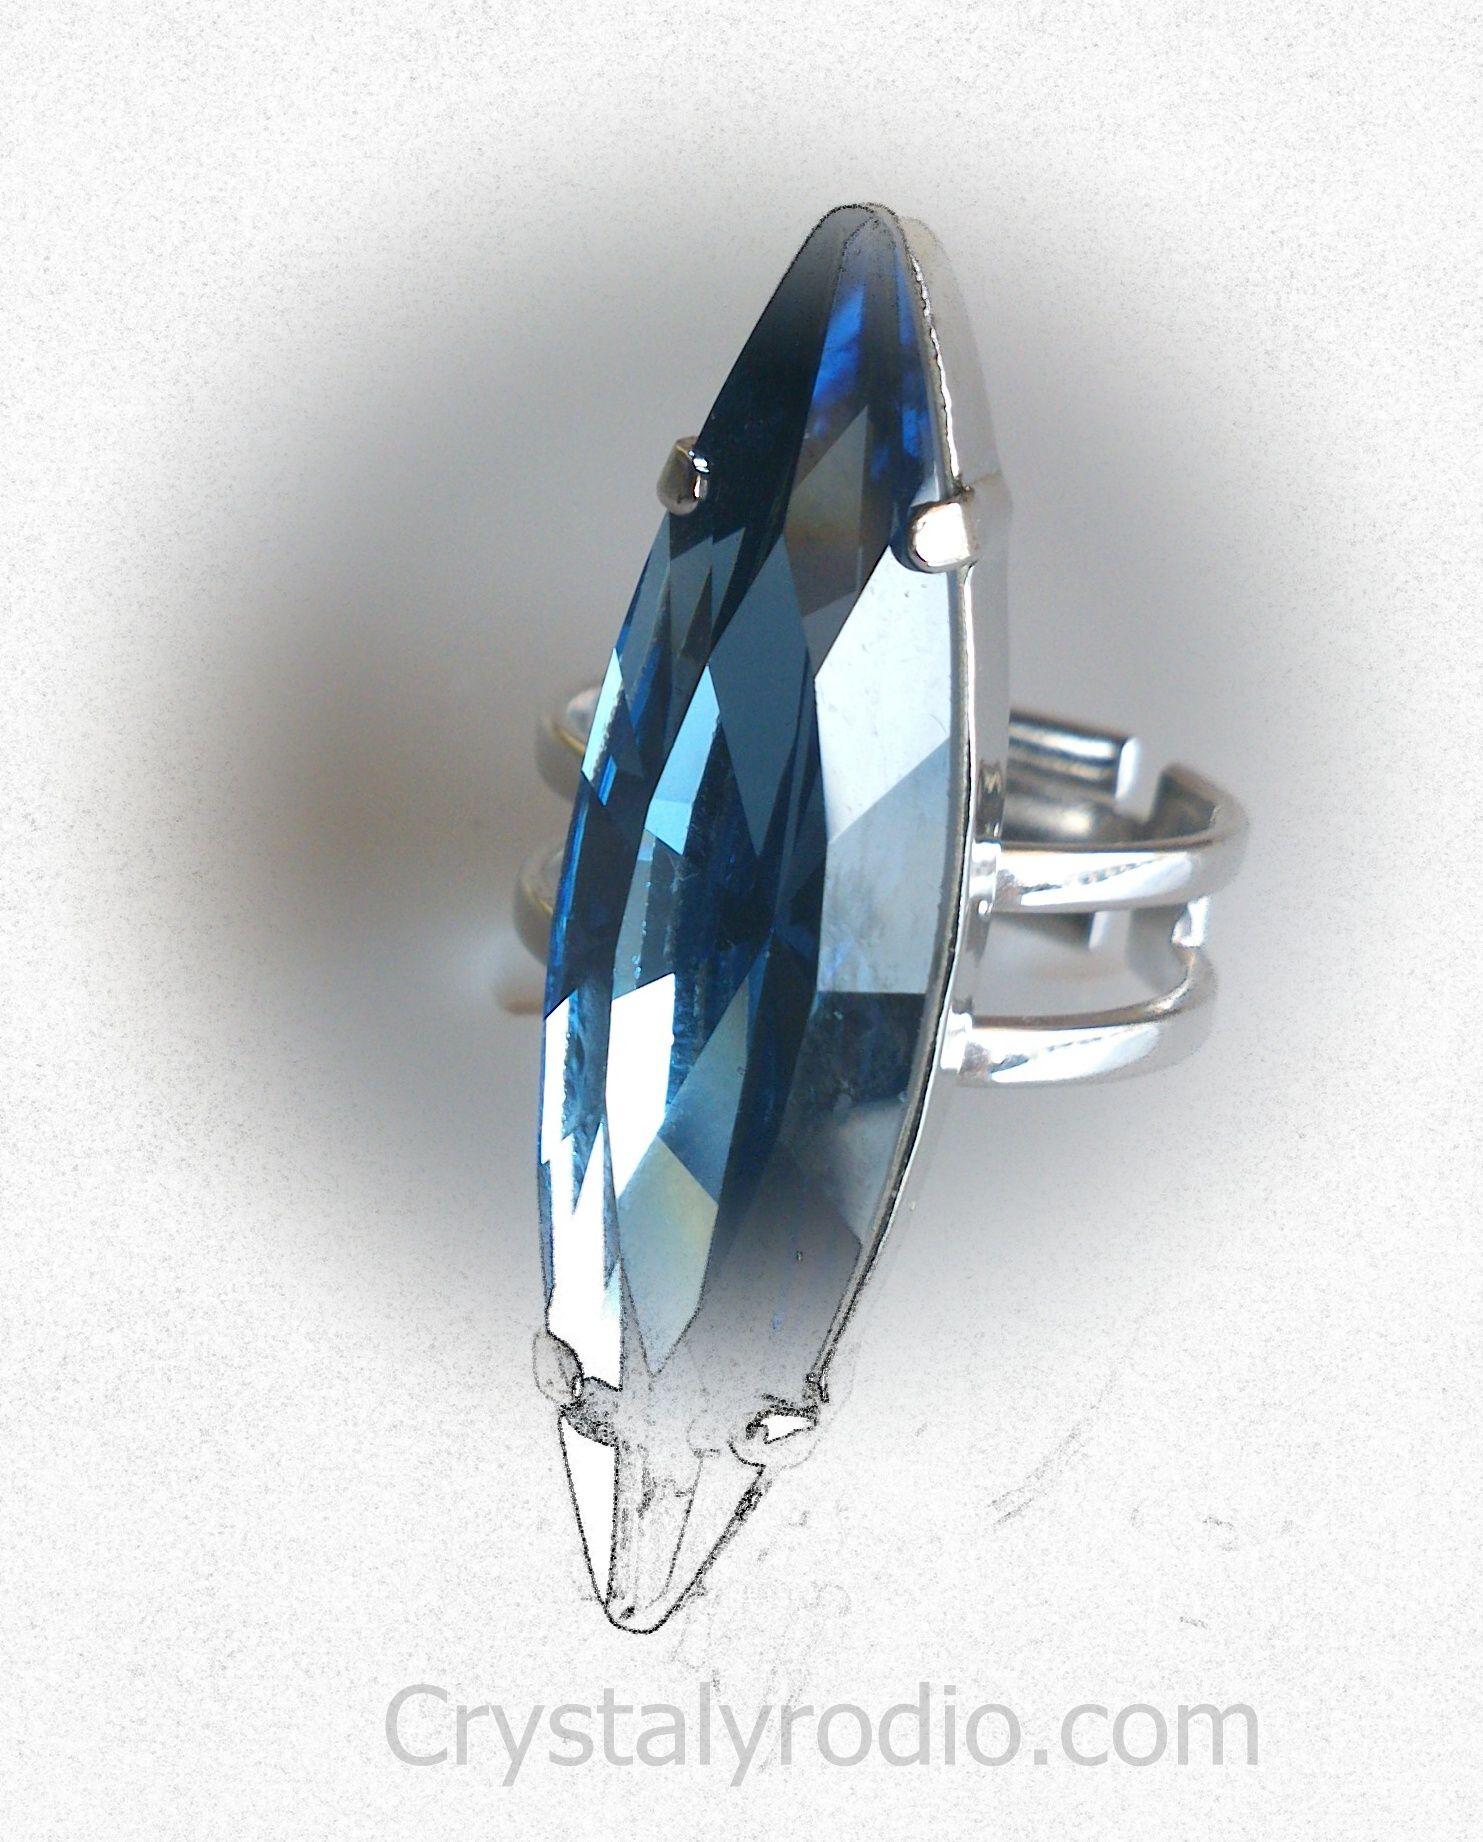 8d99b60fa4c3 Anillo de piedra oval con cristal swarovski elements una sola talla en rodio  antialeregico